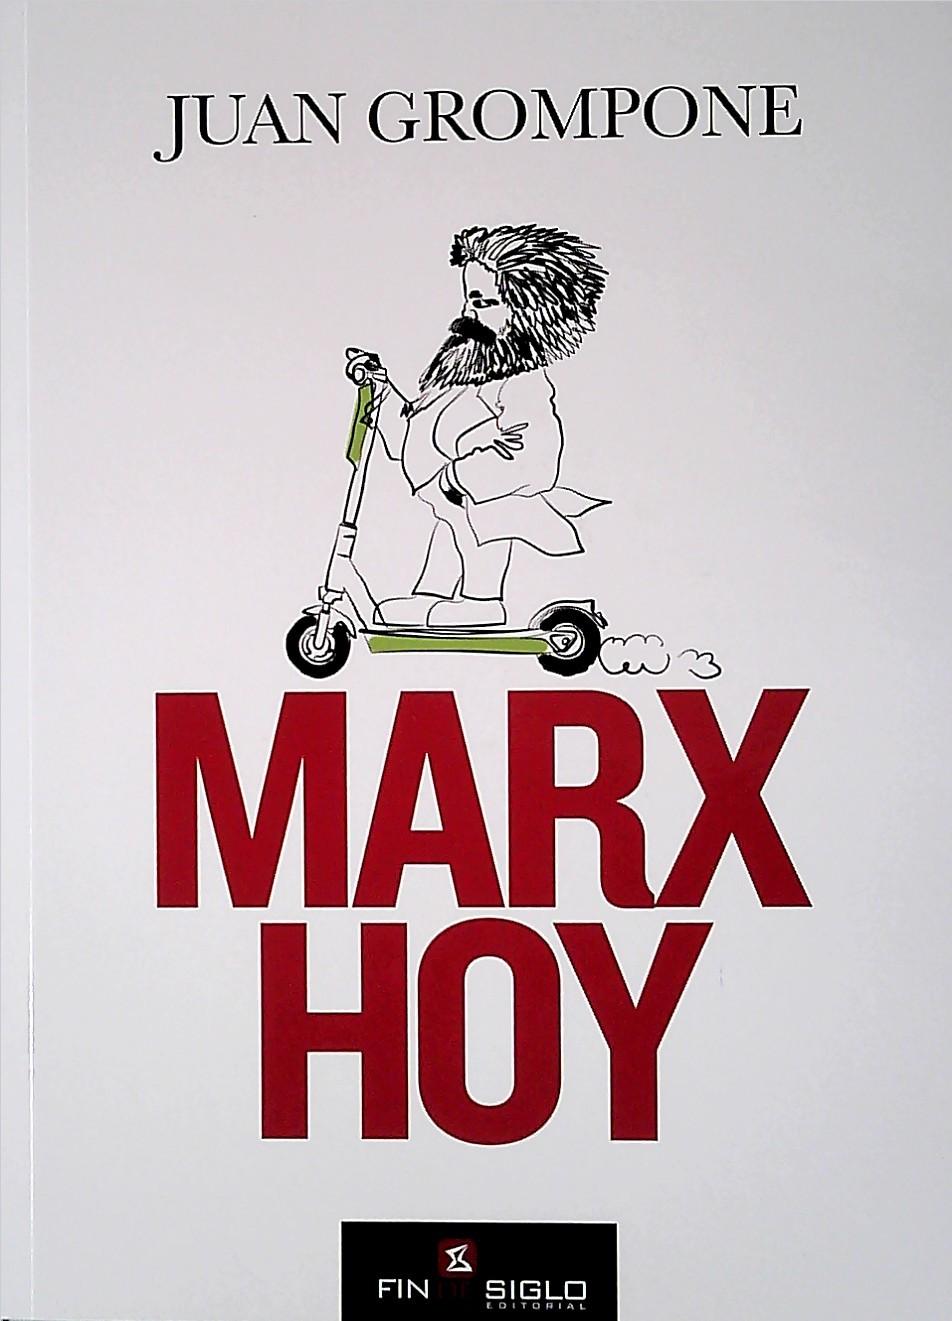 JUAN GROMPONE : MARX HOY .